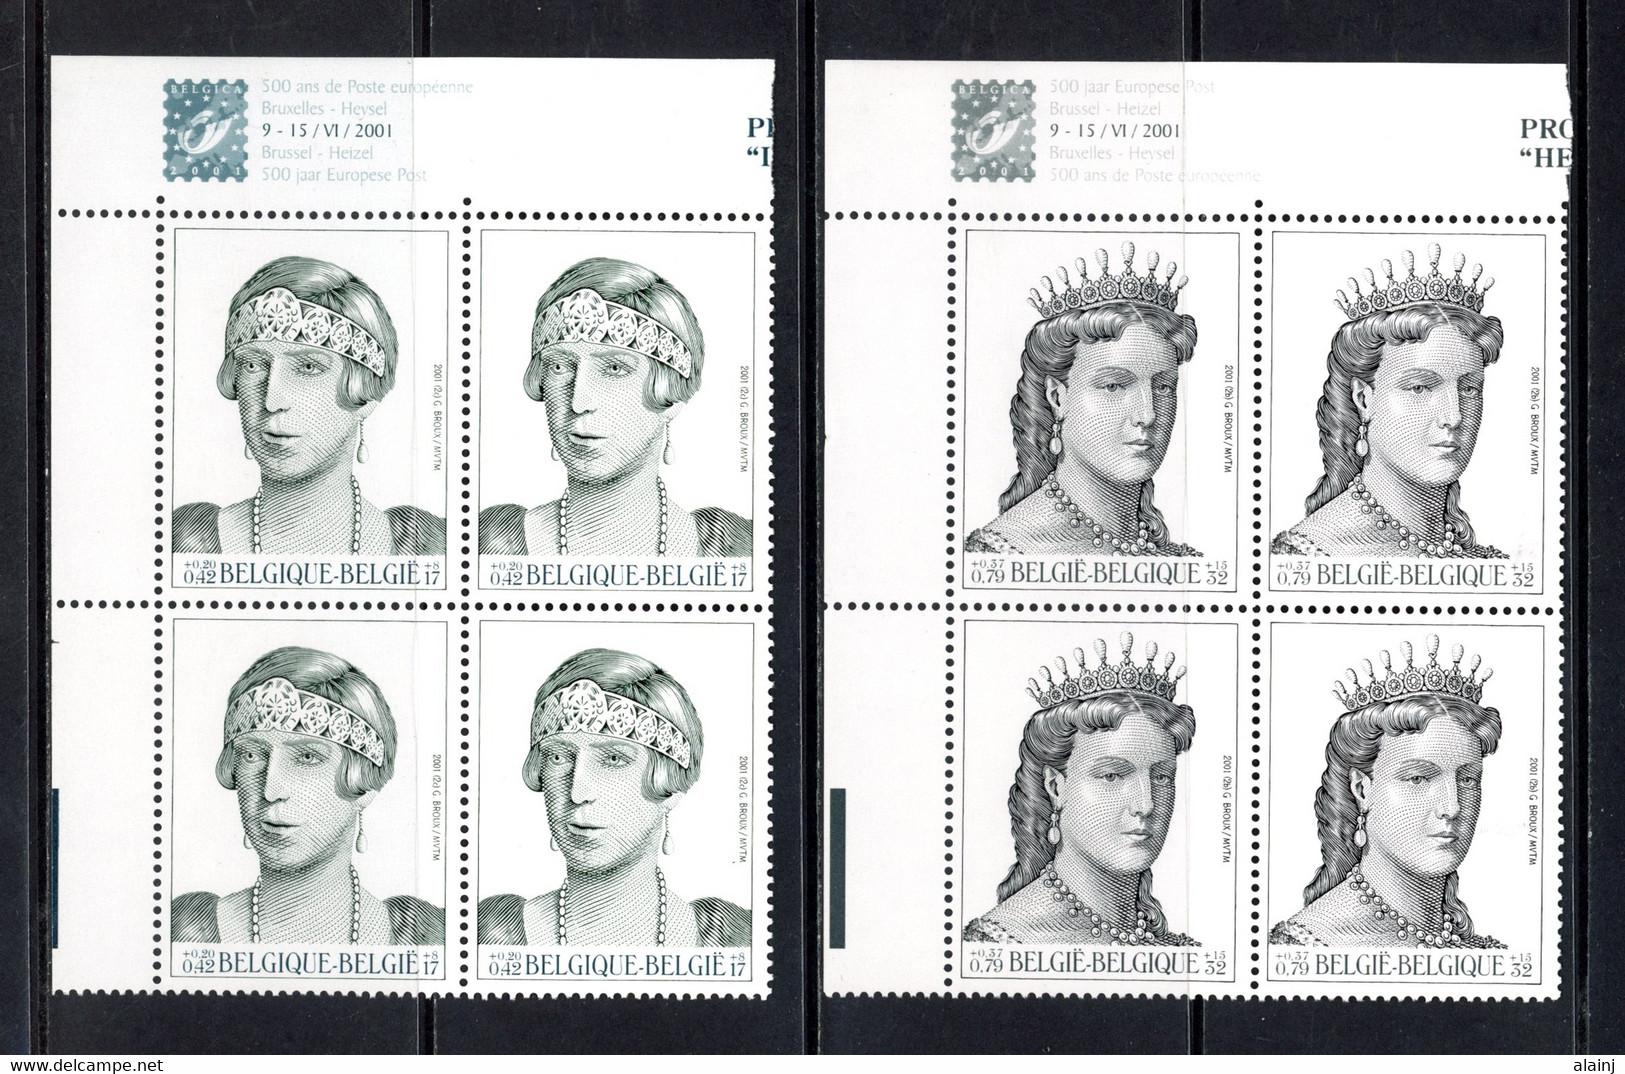 BE   2968 - 2969  XX   ---  Dynastie Belge  --  Blocs De 4 Coin De Feuille  --  Parfait état - Ongebruikt